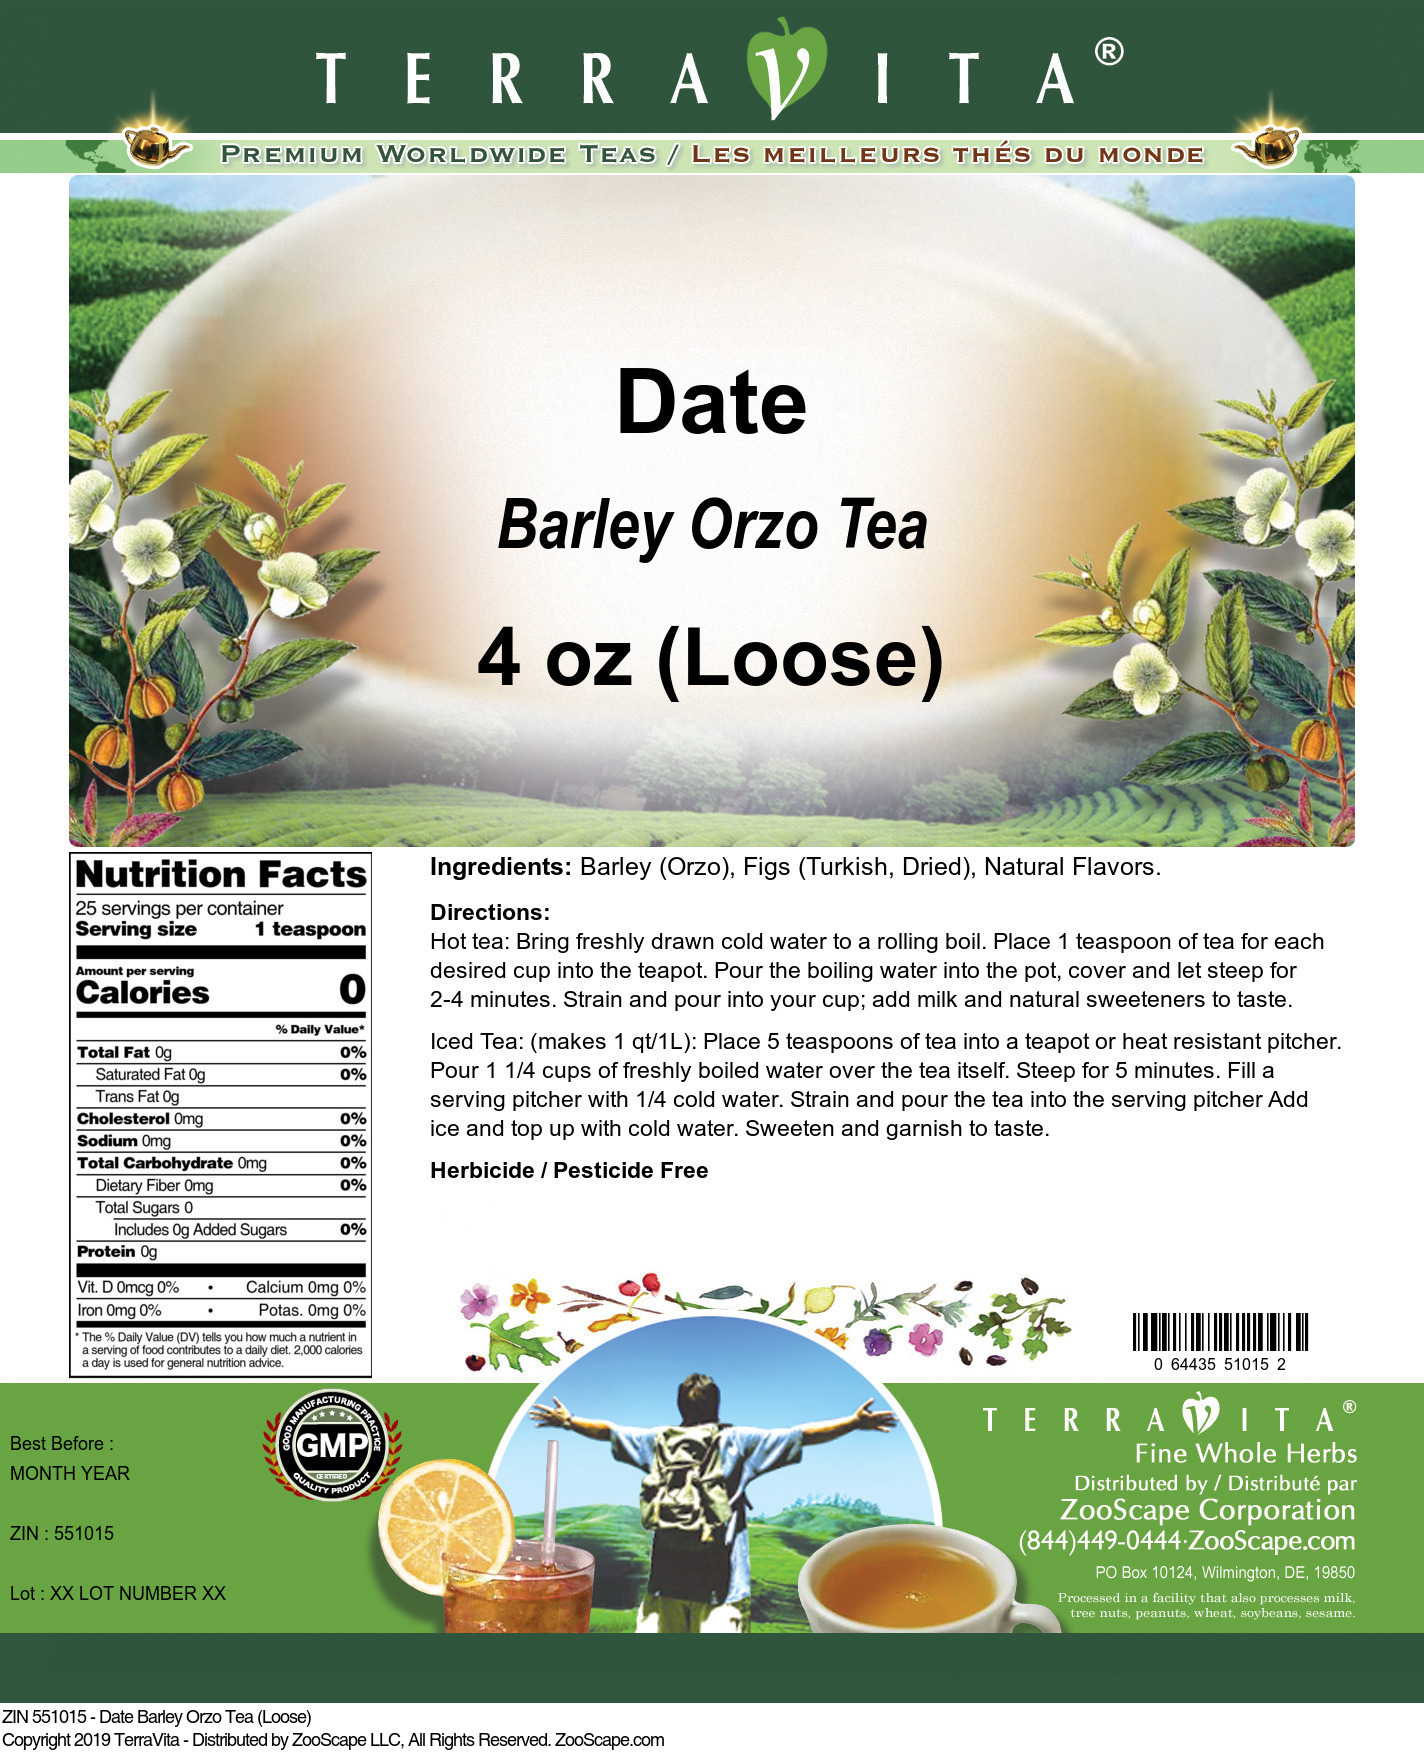 Date Barley Orzo Tea (Loose)